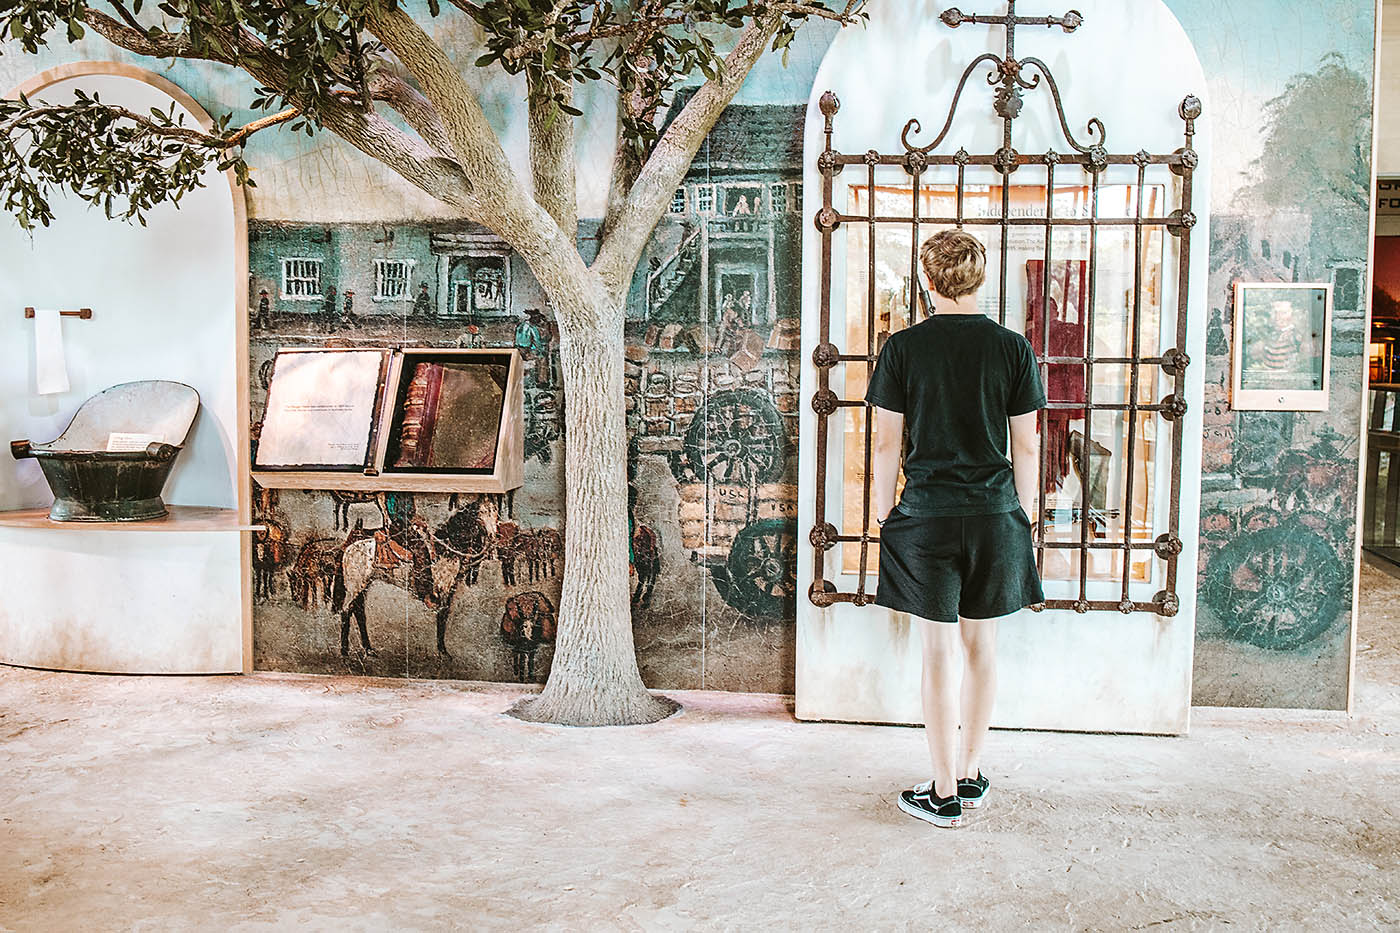 Teenaged Boy looking at San Antonio exhibit at a museum